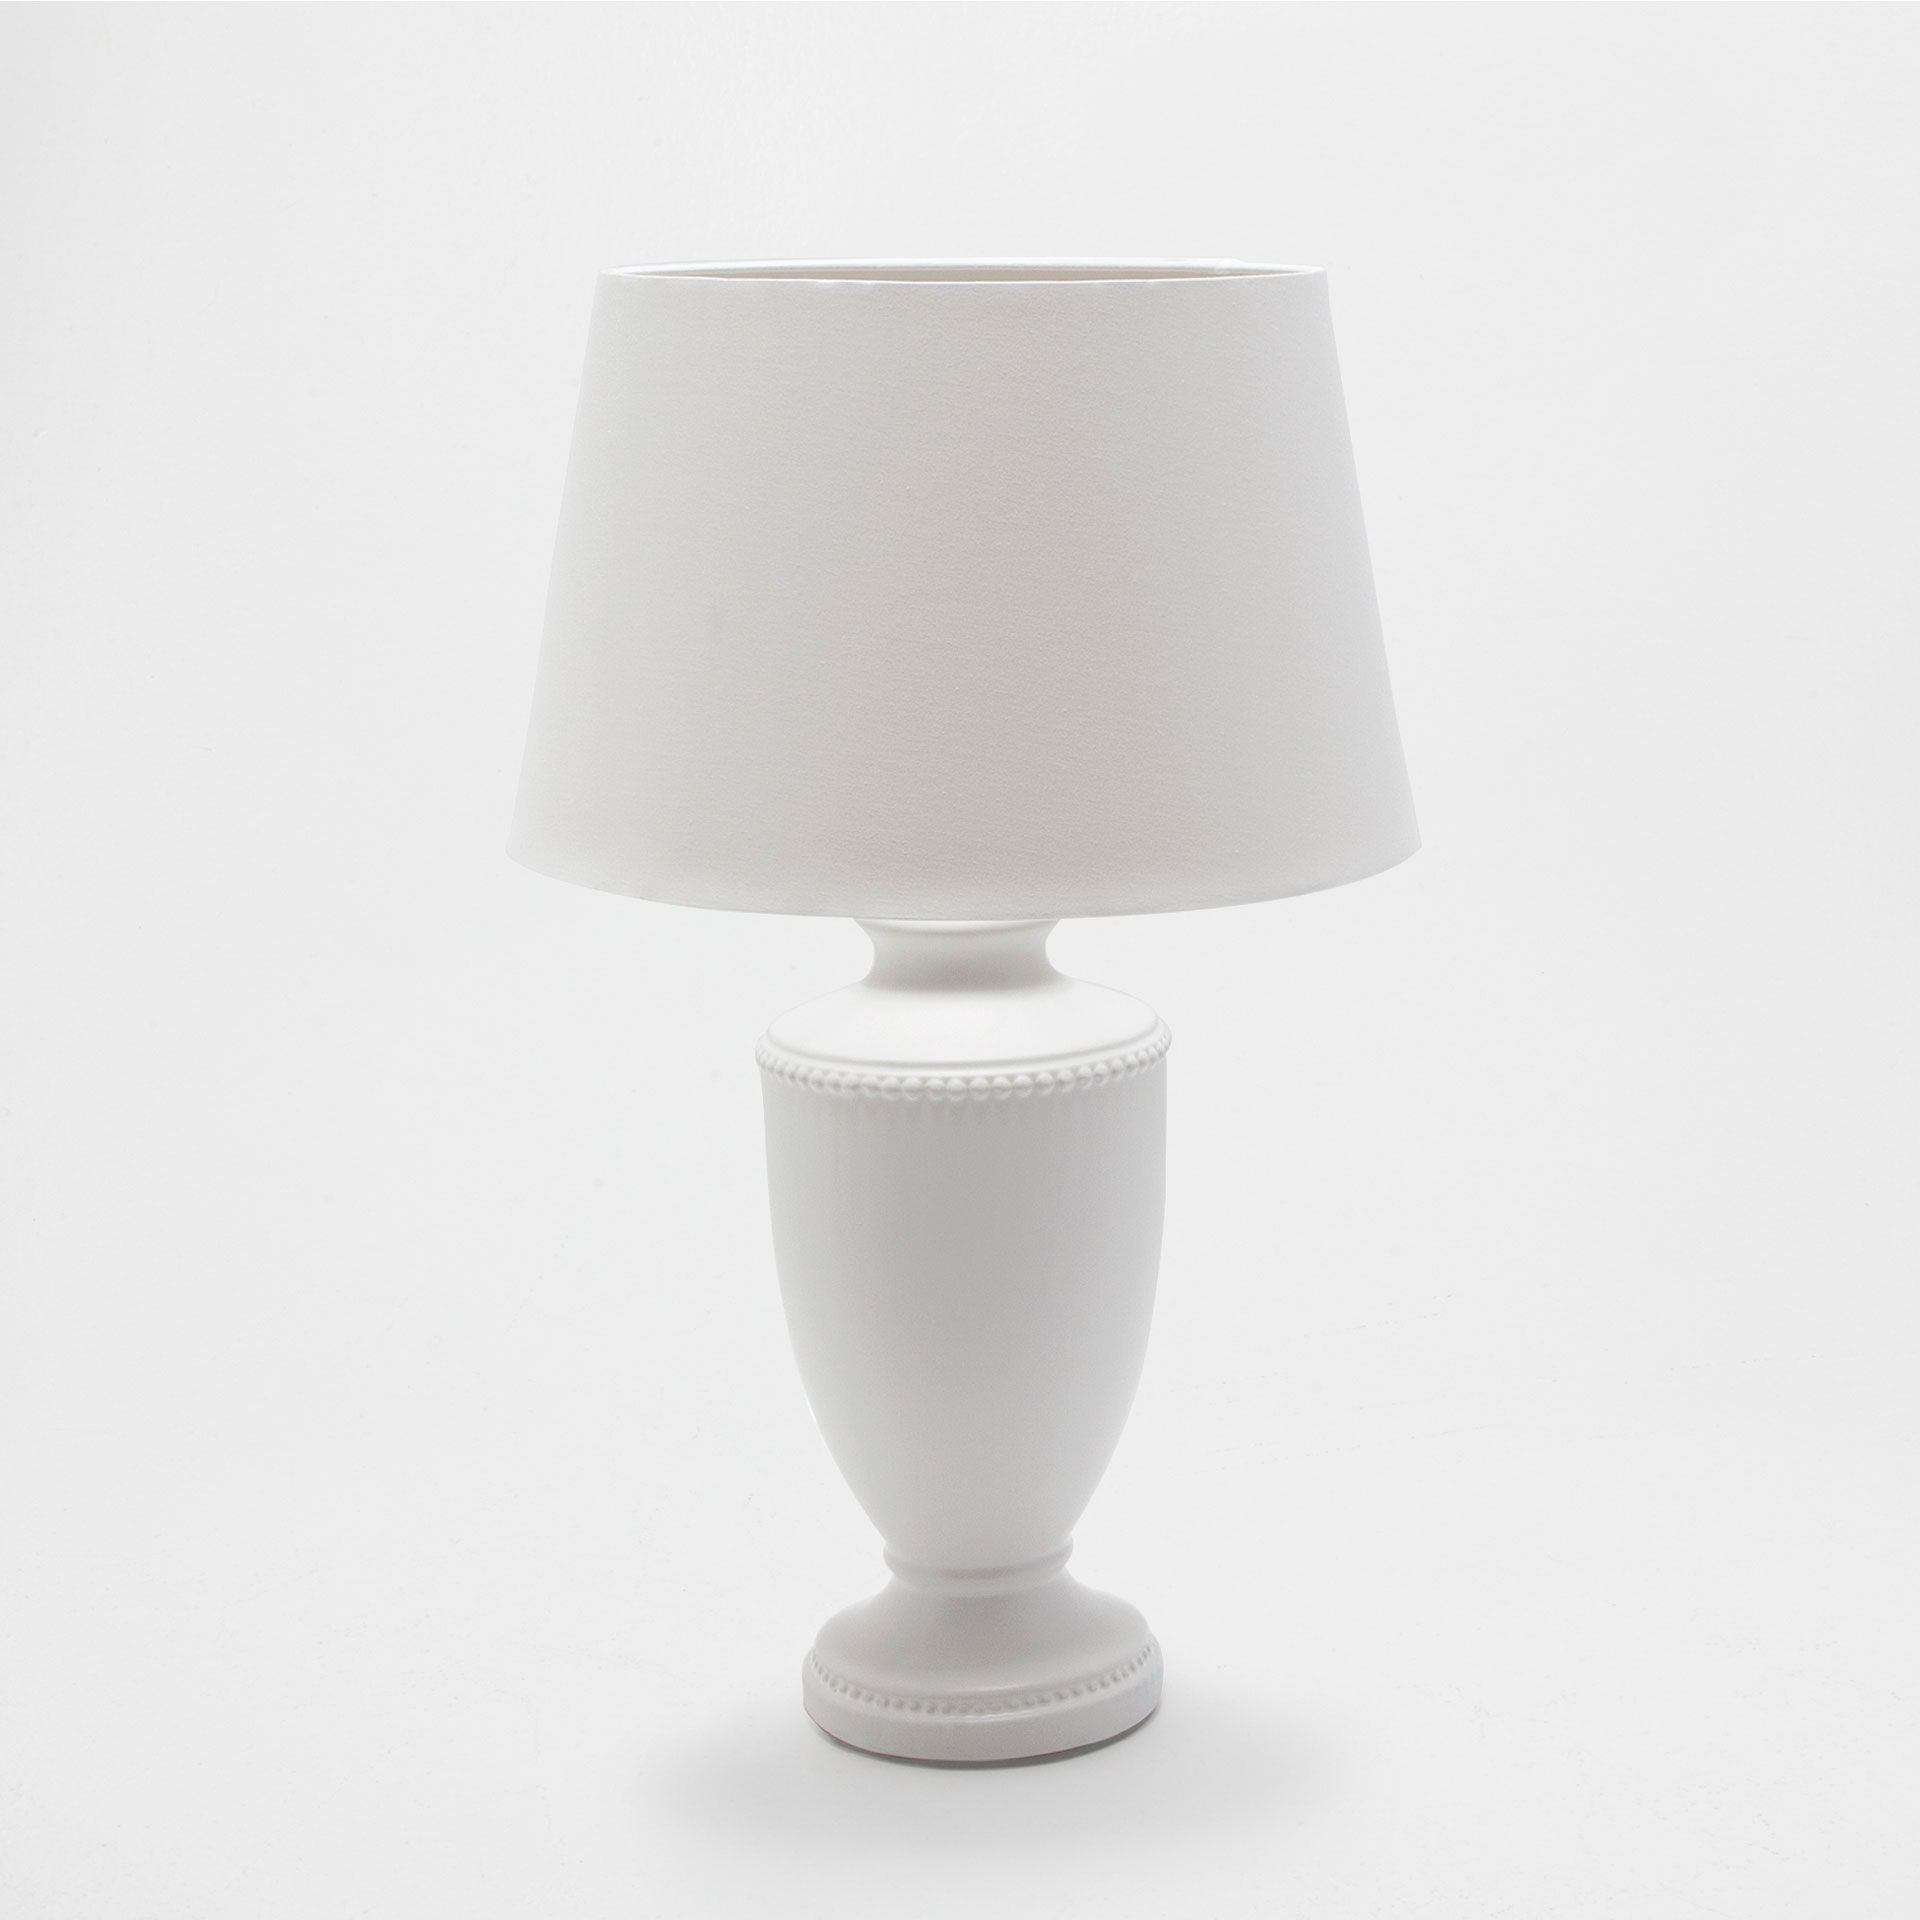 WHITE CERAMIC LAMP - Lamps - Decoration | Zara Home Canada | Lamps ...